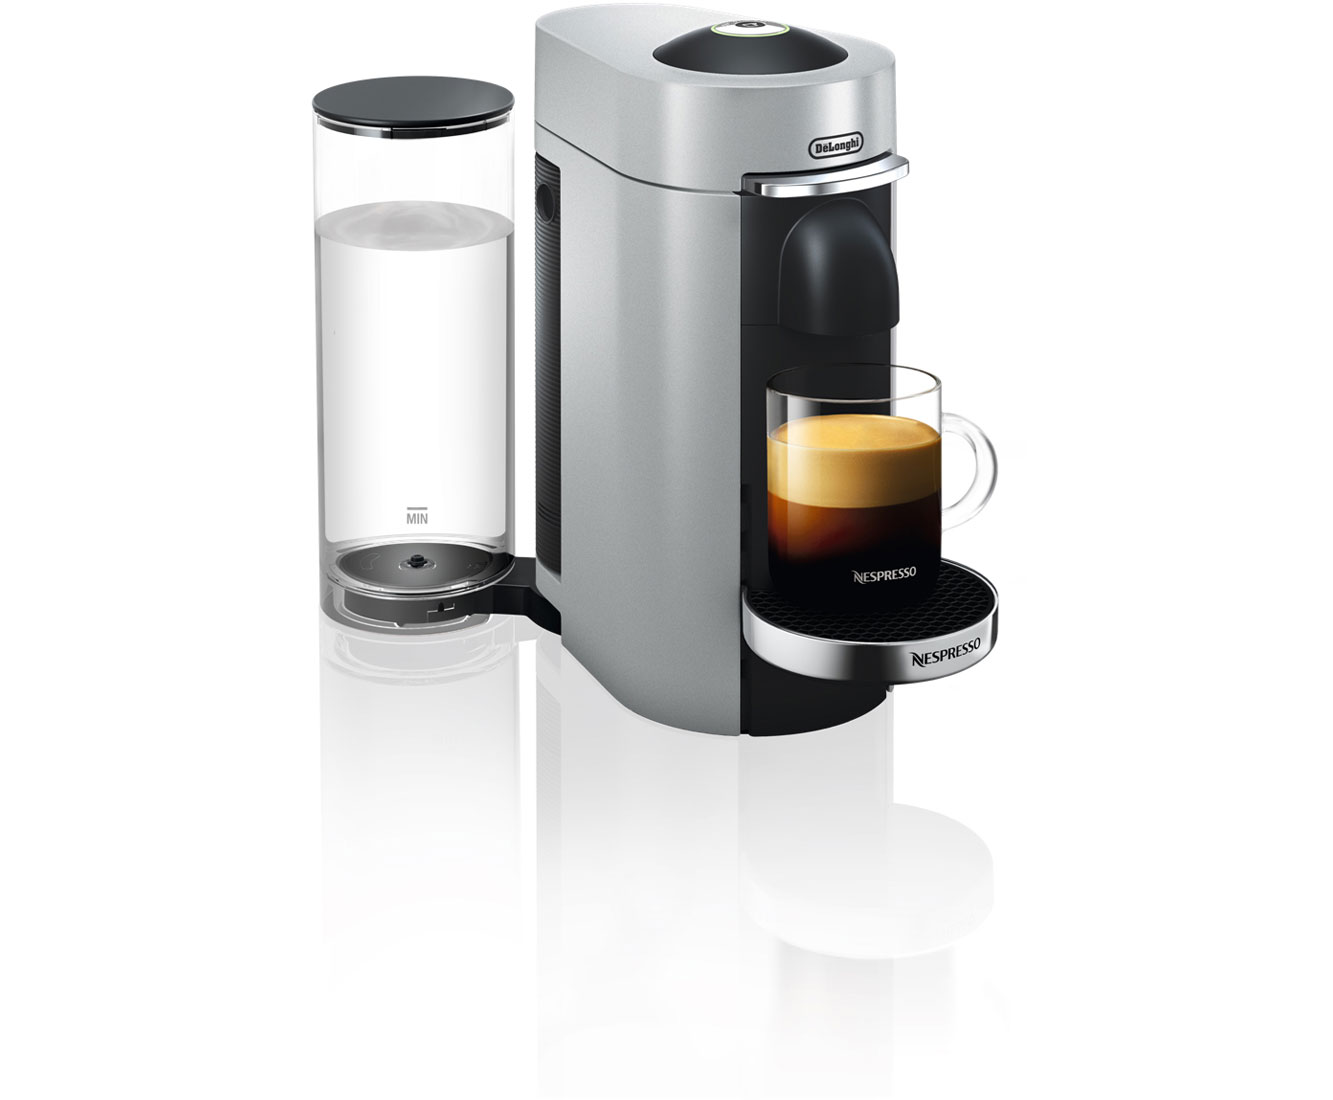 DeLonghi Nespresso Vertuo Plus Deluxe ENV155.S Kaffeemaschinen - Silber / Schwarz | Küche und Esszimmer > Kaffee und Tee > Espressomaschinen | Silber - Schwarz | DeLonghi Nespresso